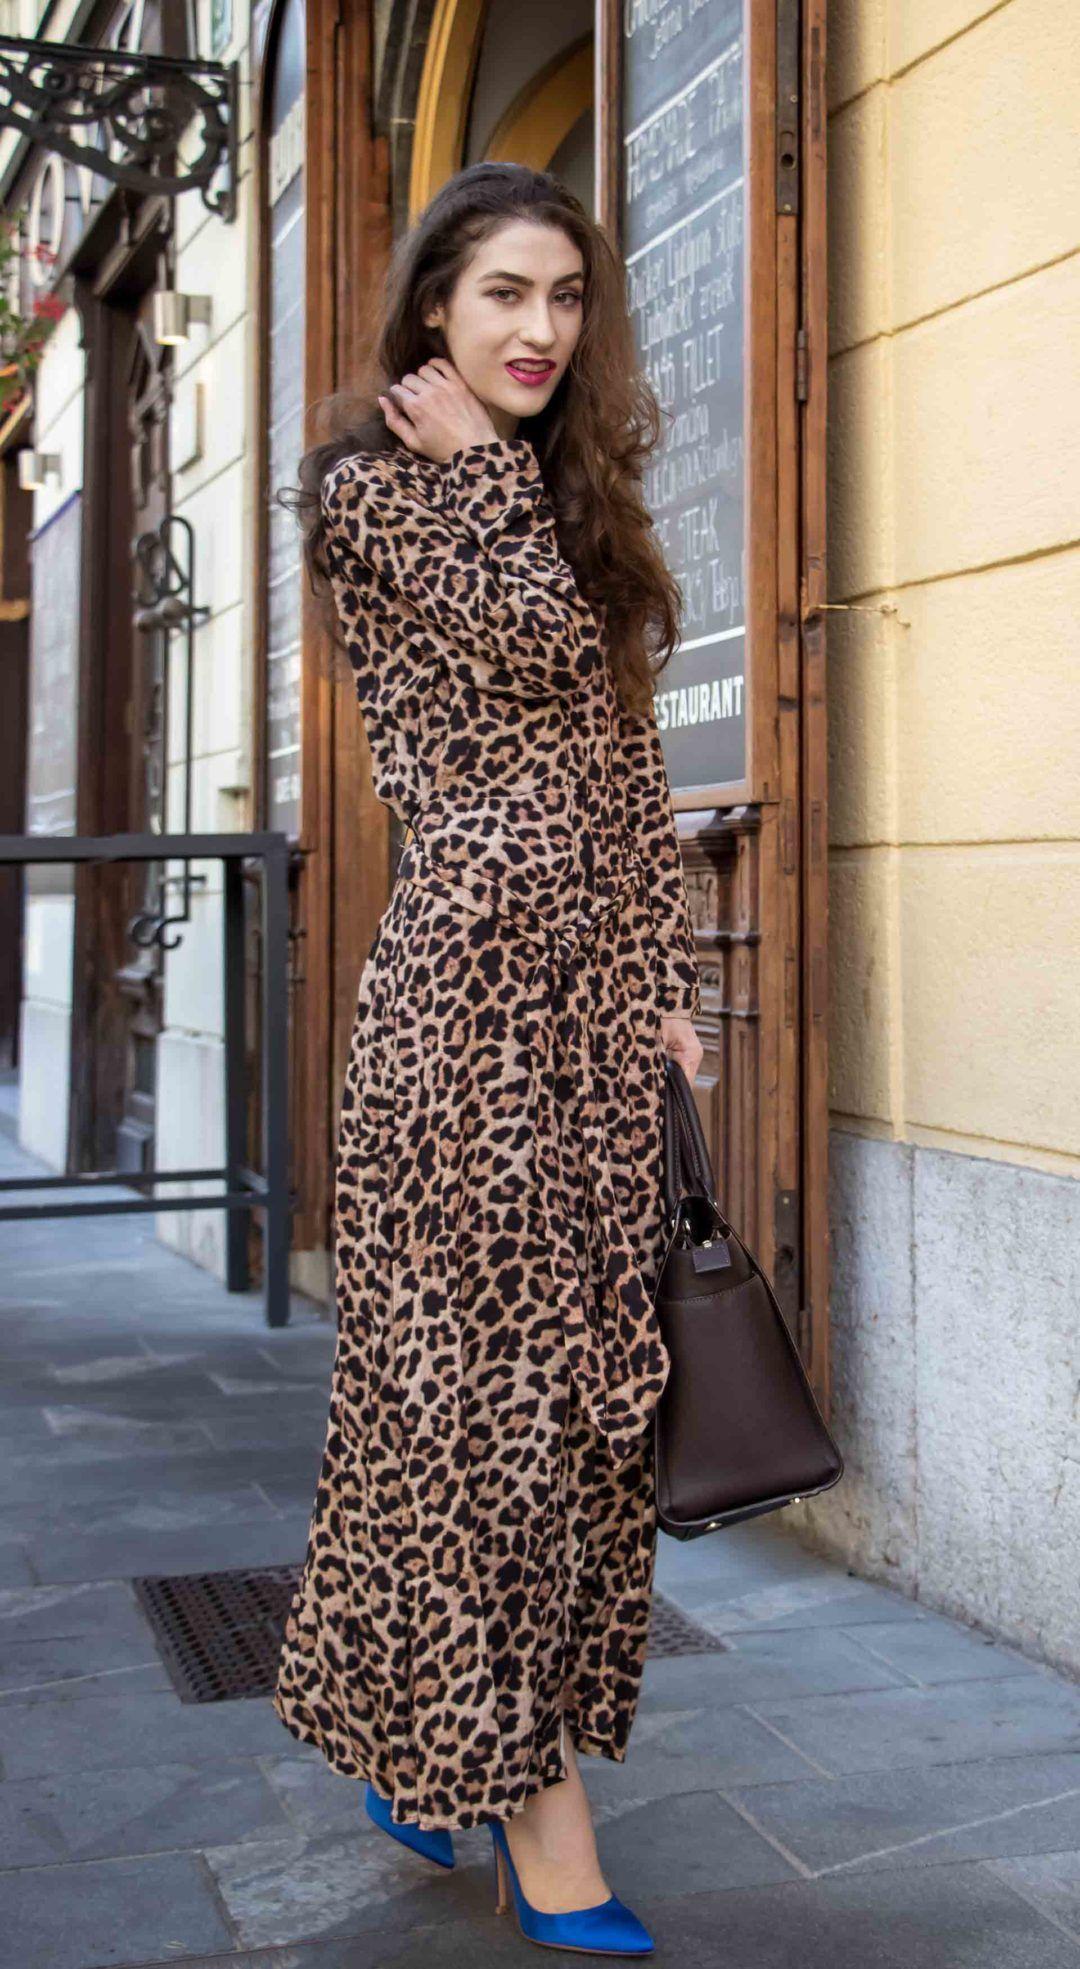 How To Wear Leopard Print Dress Brunette From Wall Street Leopard Print Dress Print Dress Animal Print Dresses